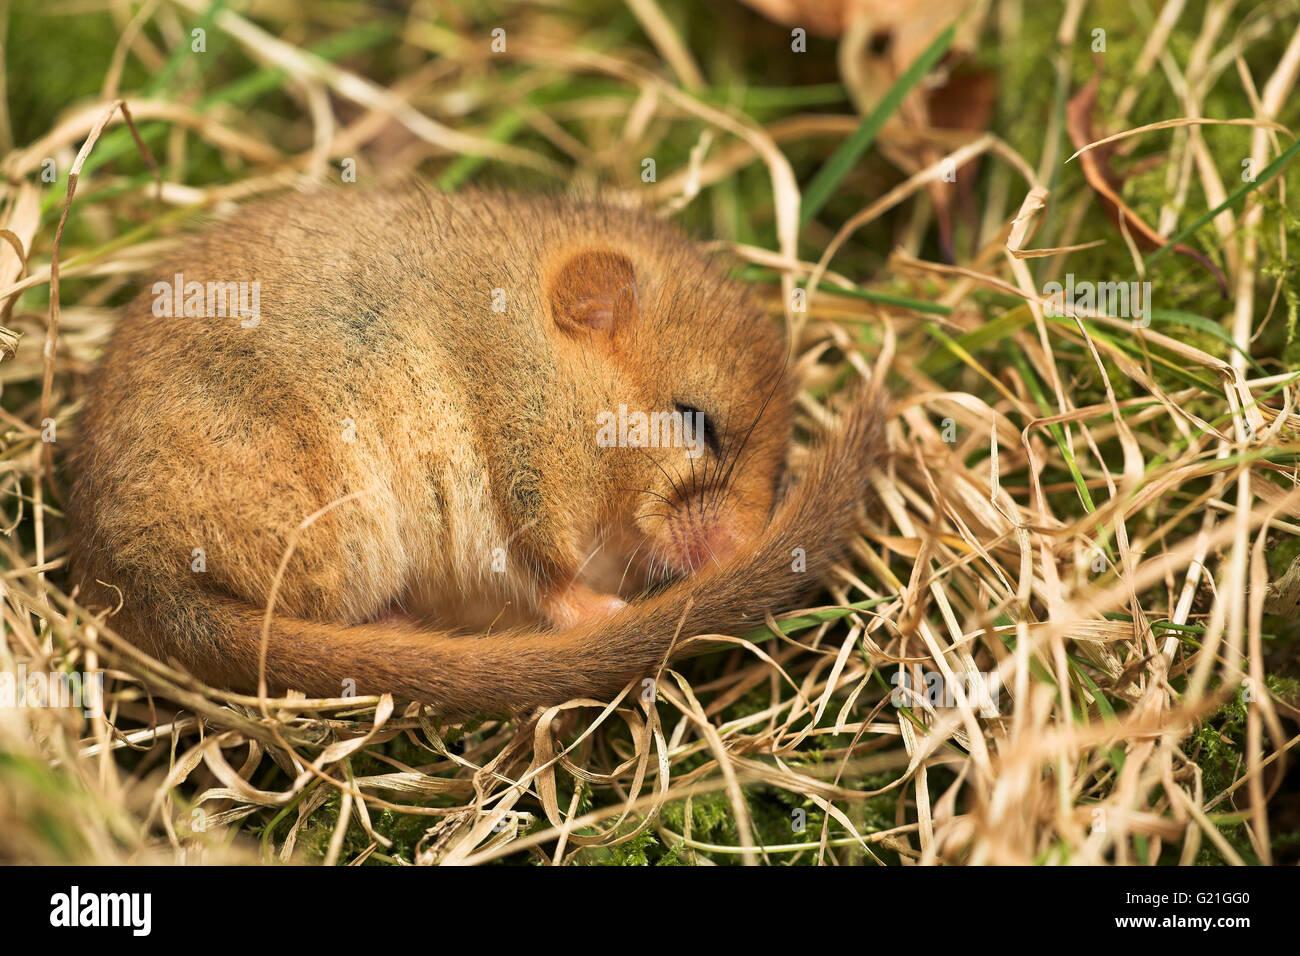 Common dormouse Muscardinus avellanarius hibernating Dorset England - Stock Image